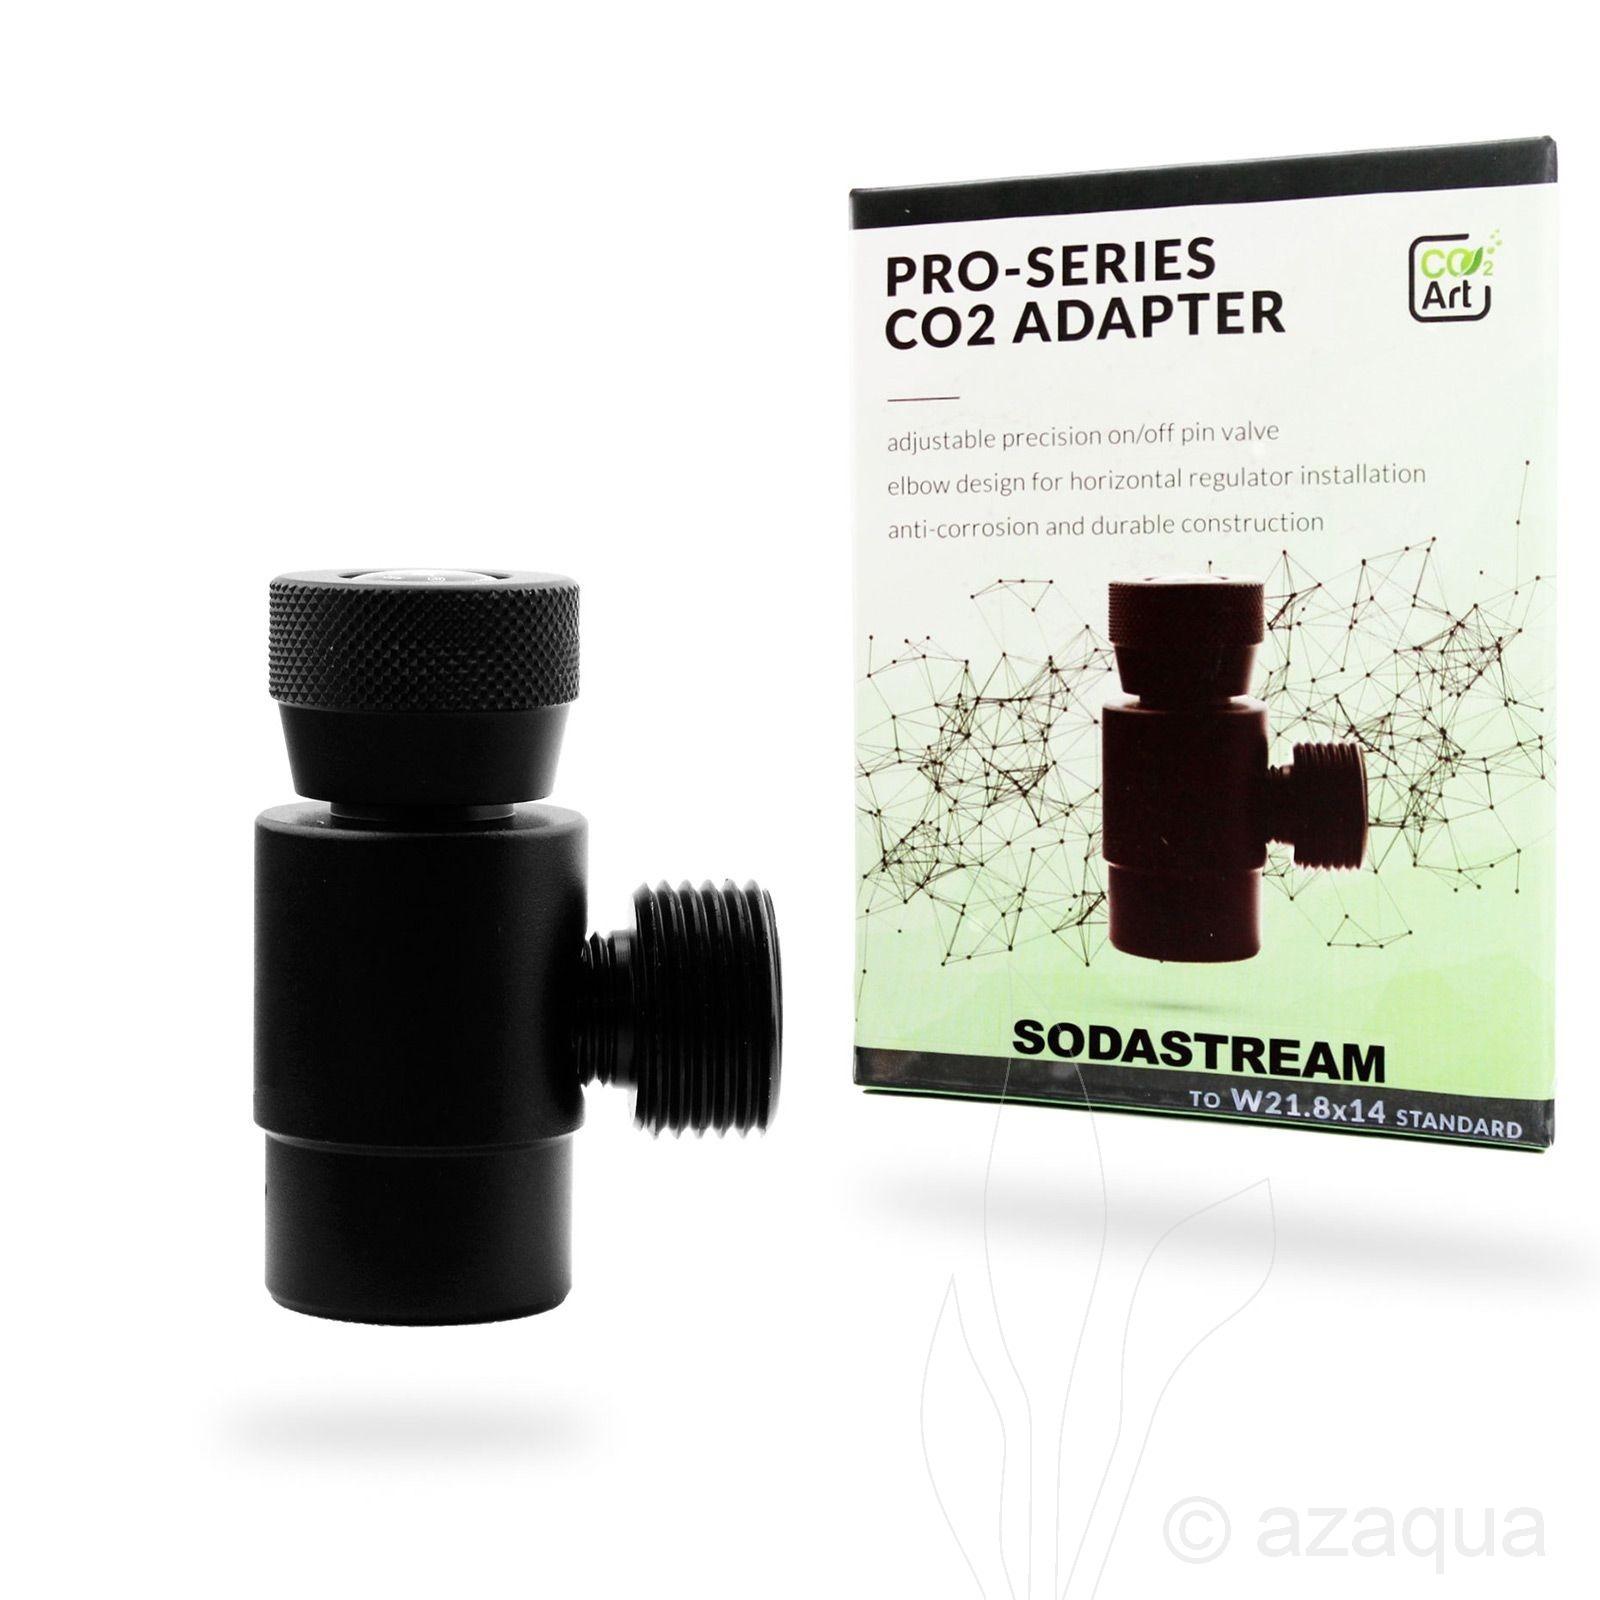 CO2Art Pro-Series CO2 Adapter – Sodastream